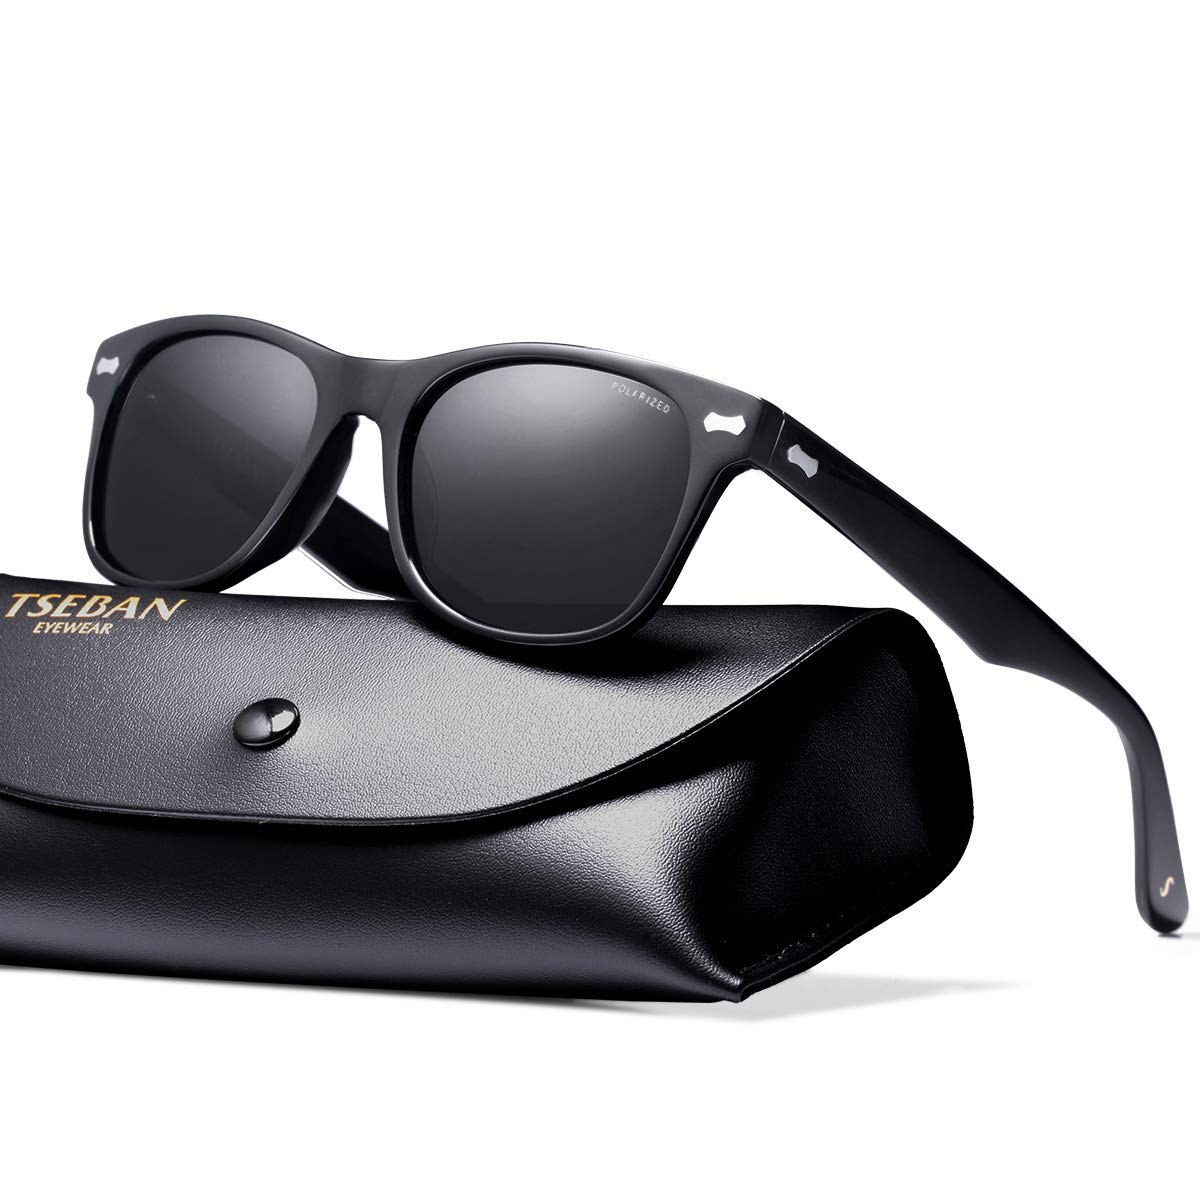 539c945c68ae33 TSEBAN Retro Polarisierte Damen Sonnenbrille Herren Sonnenbrille 100 ...